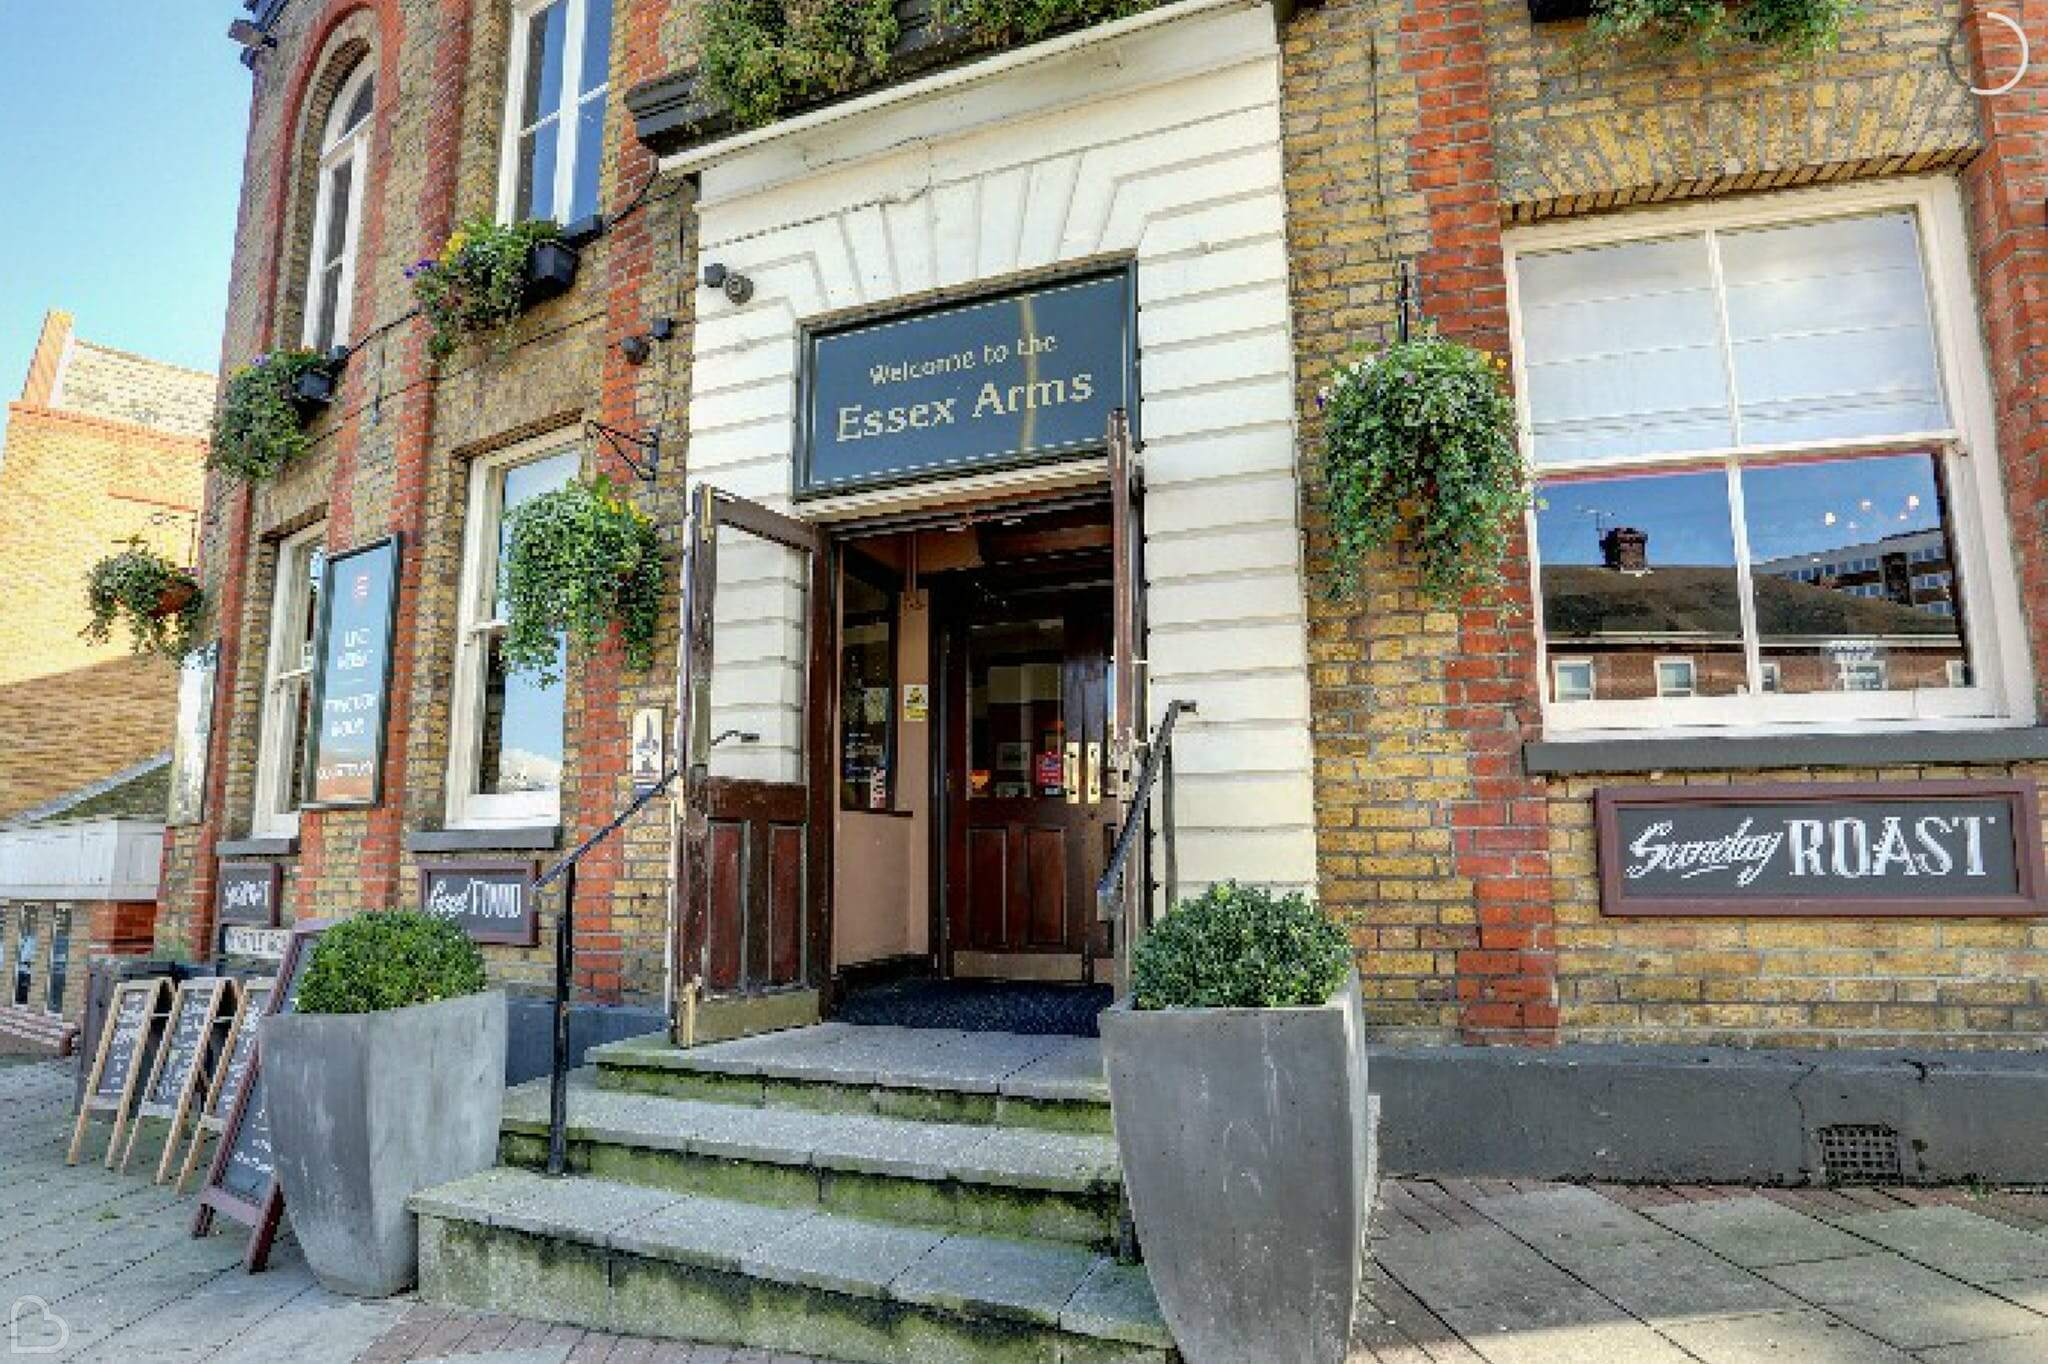 Essex Arms wedding venue in Essex